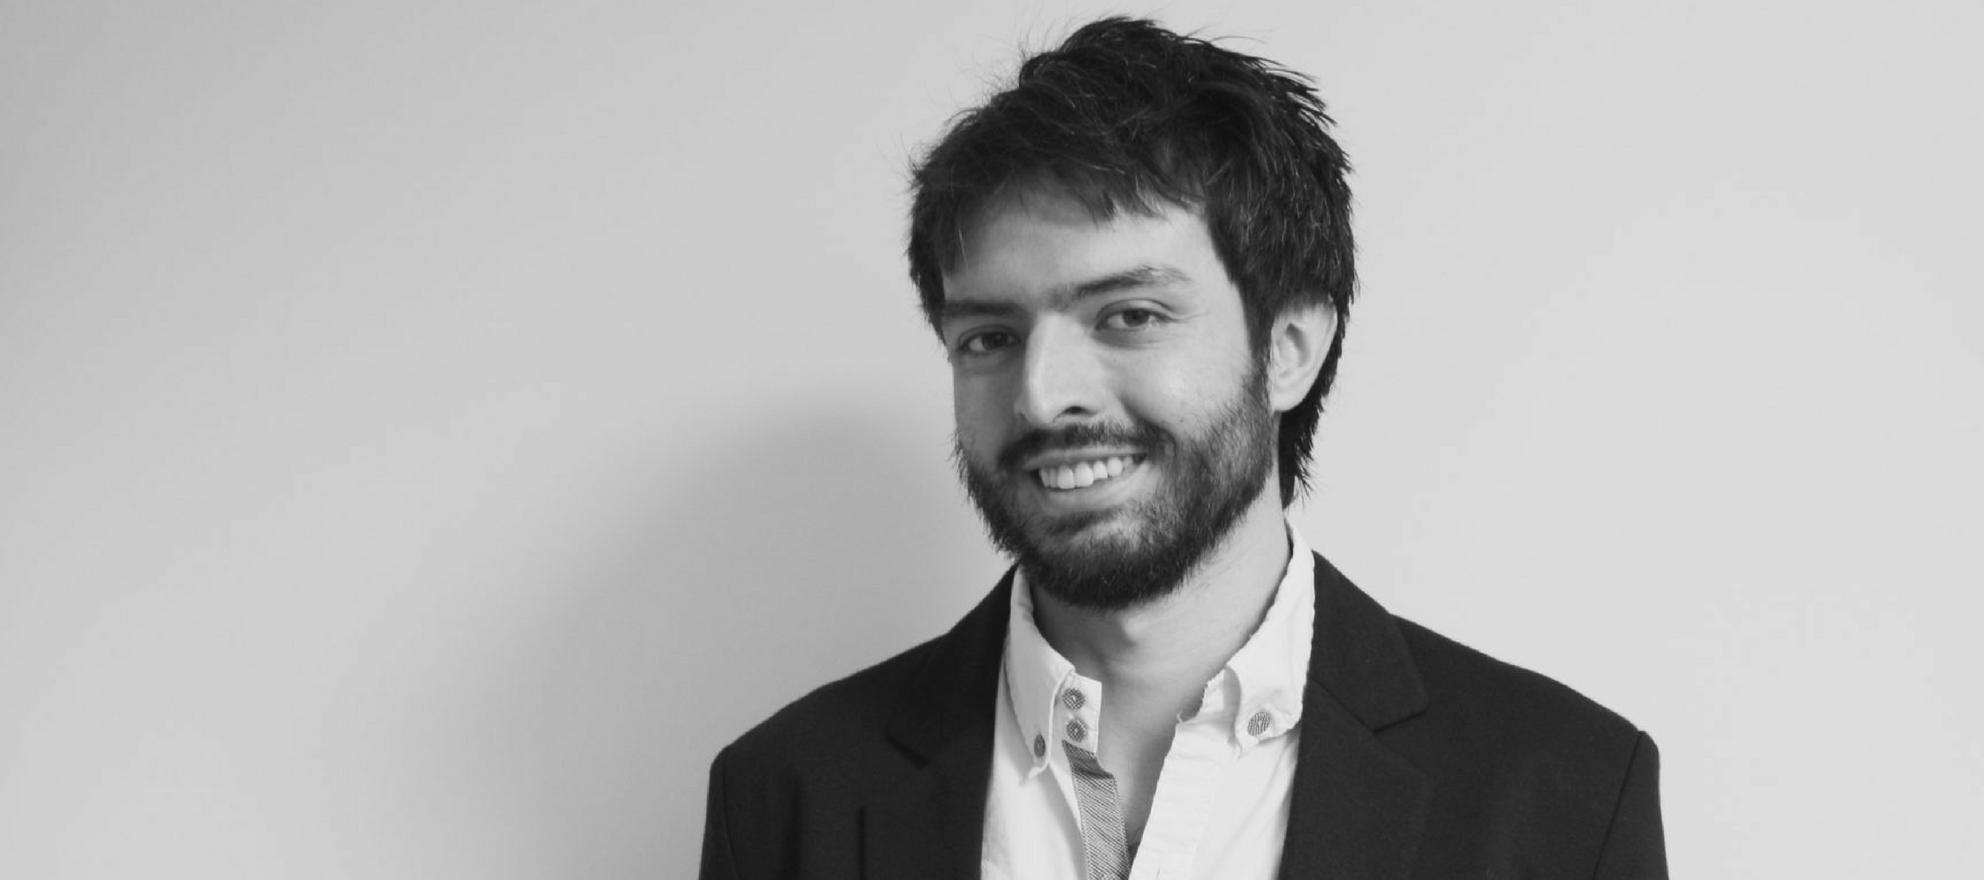 inman news editor in chief carl franzen